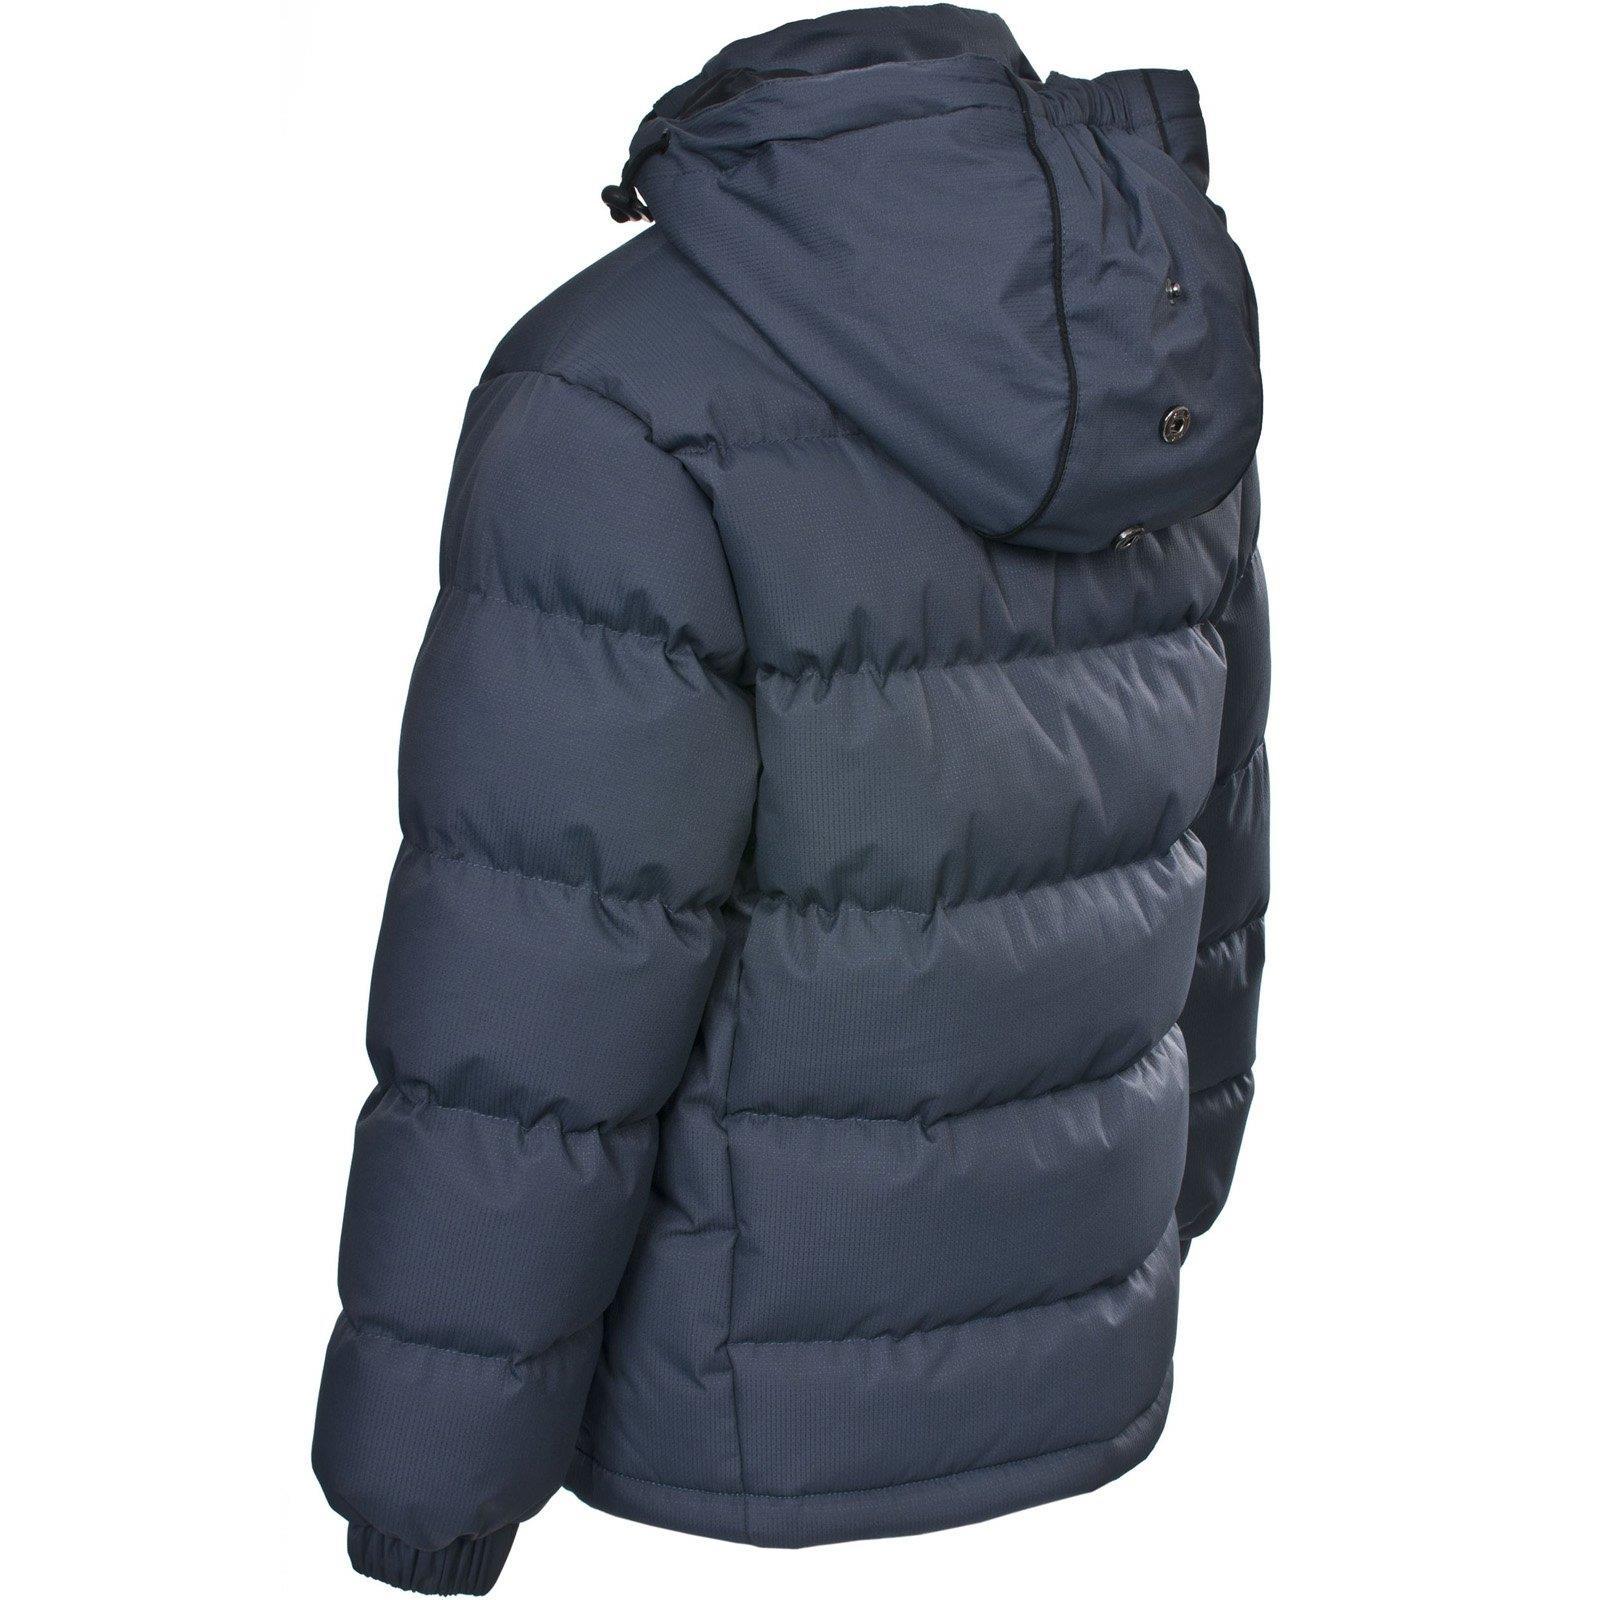 miniatuur 3 - Trespass Tuff Boys Puffa Jacket Padded School Coat Childs Childrens 2-13 Years